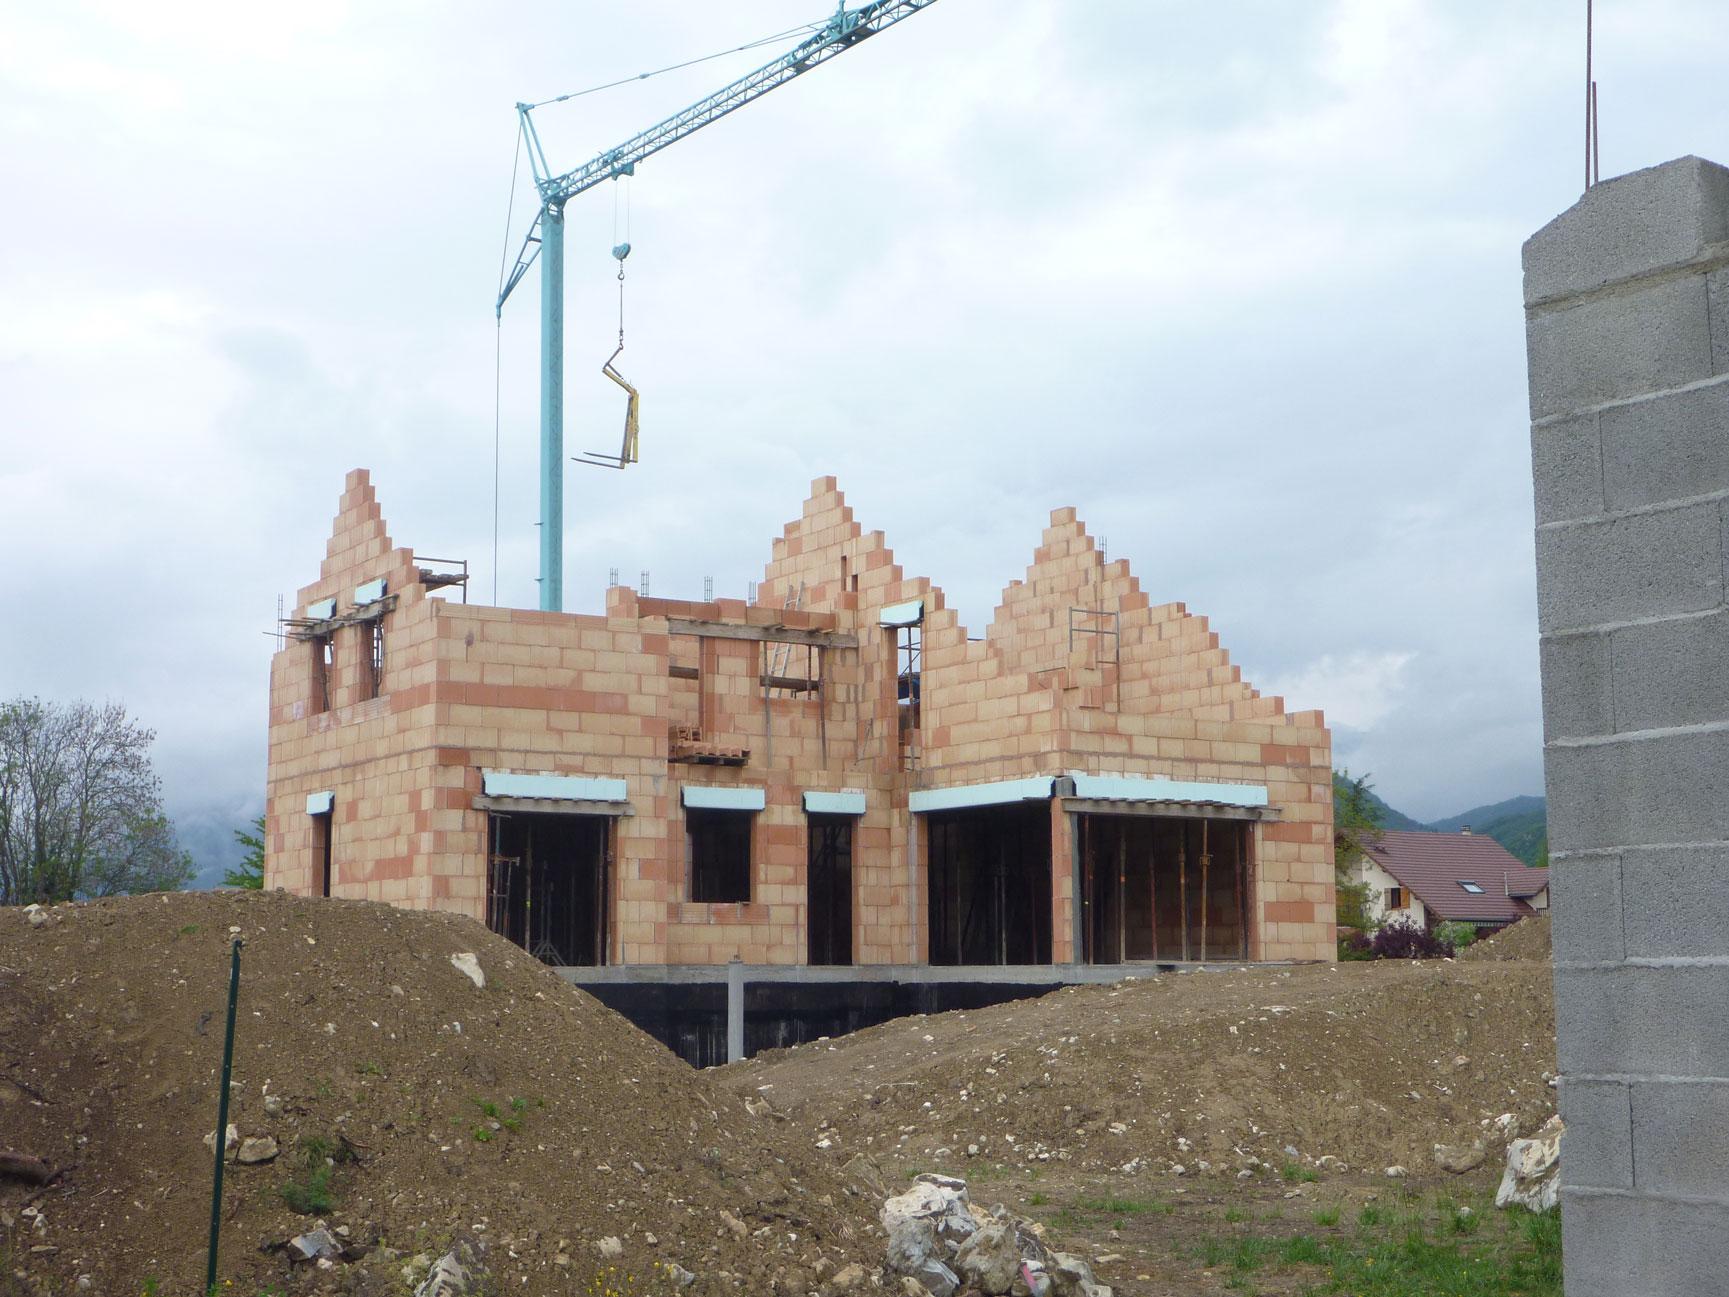 gros-oeuvre-construction-brique-zanardi-btp-allevard-villa-a-myans-73